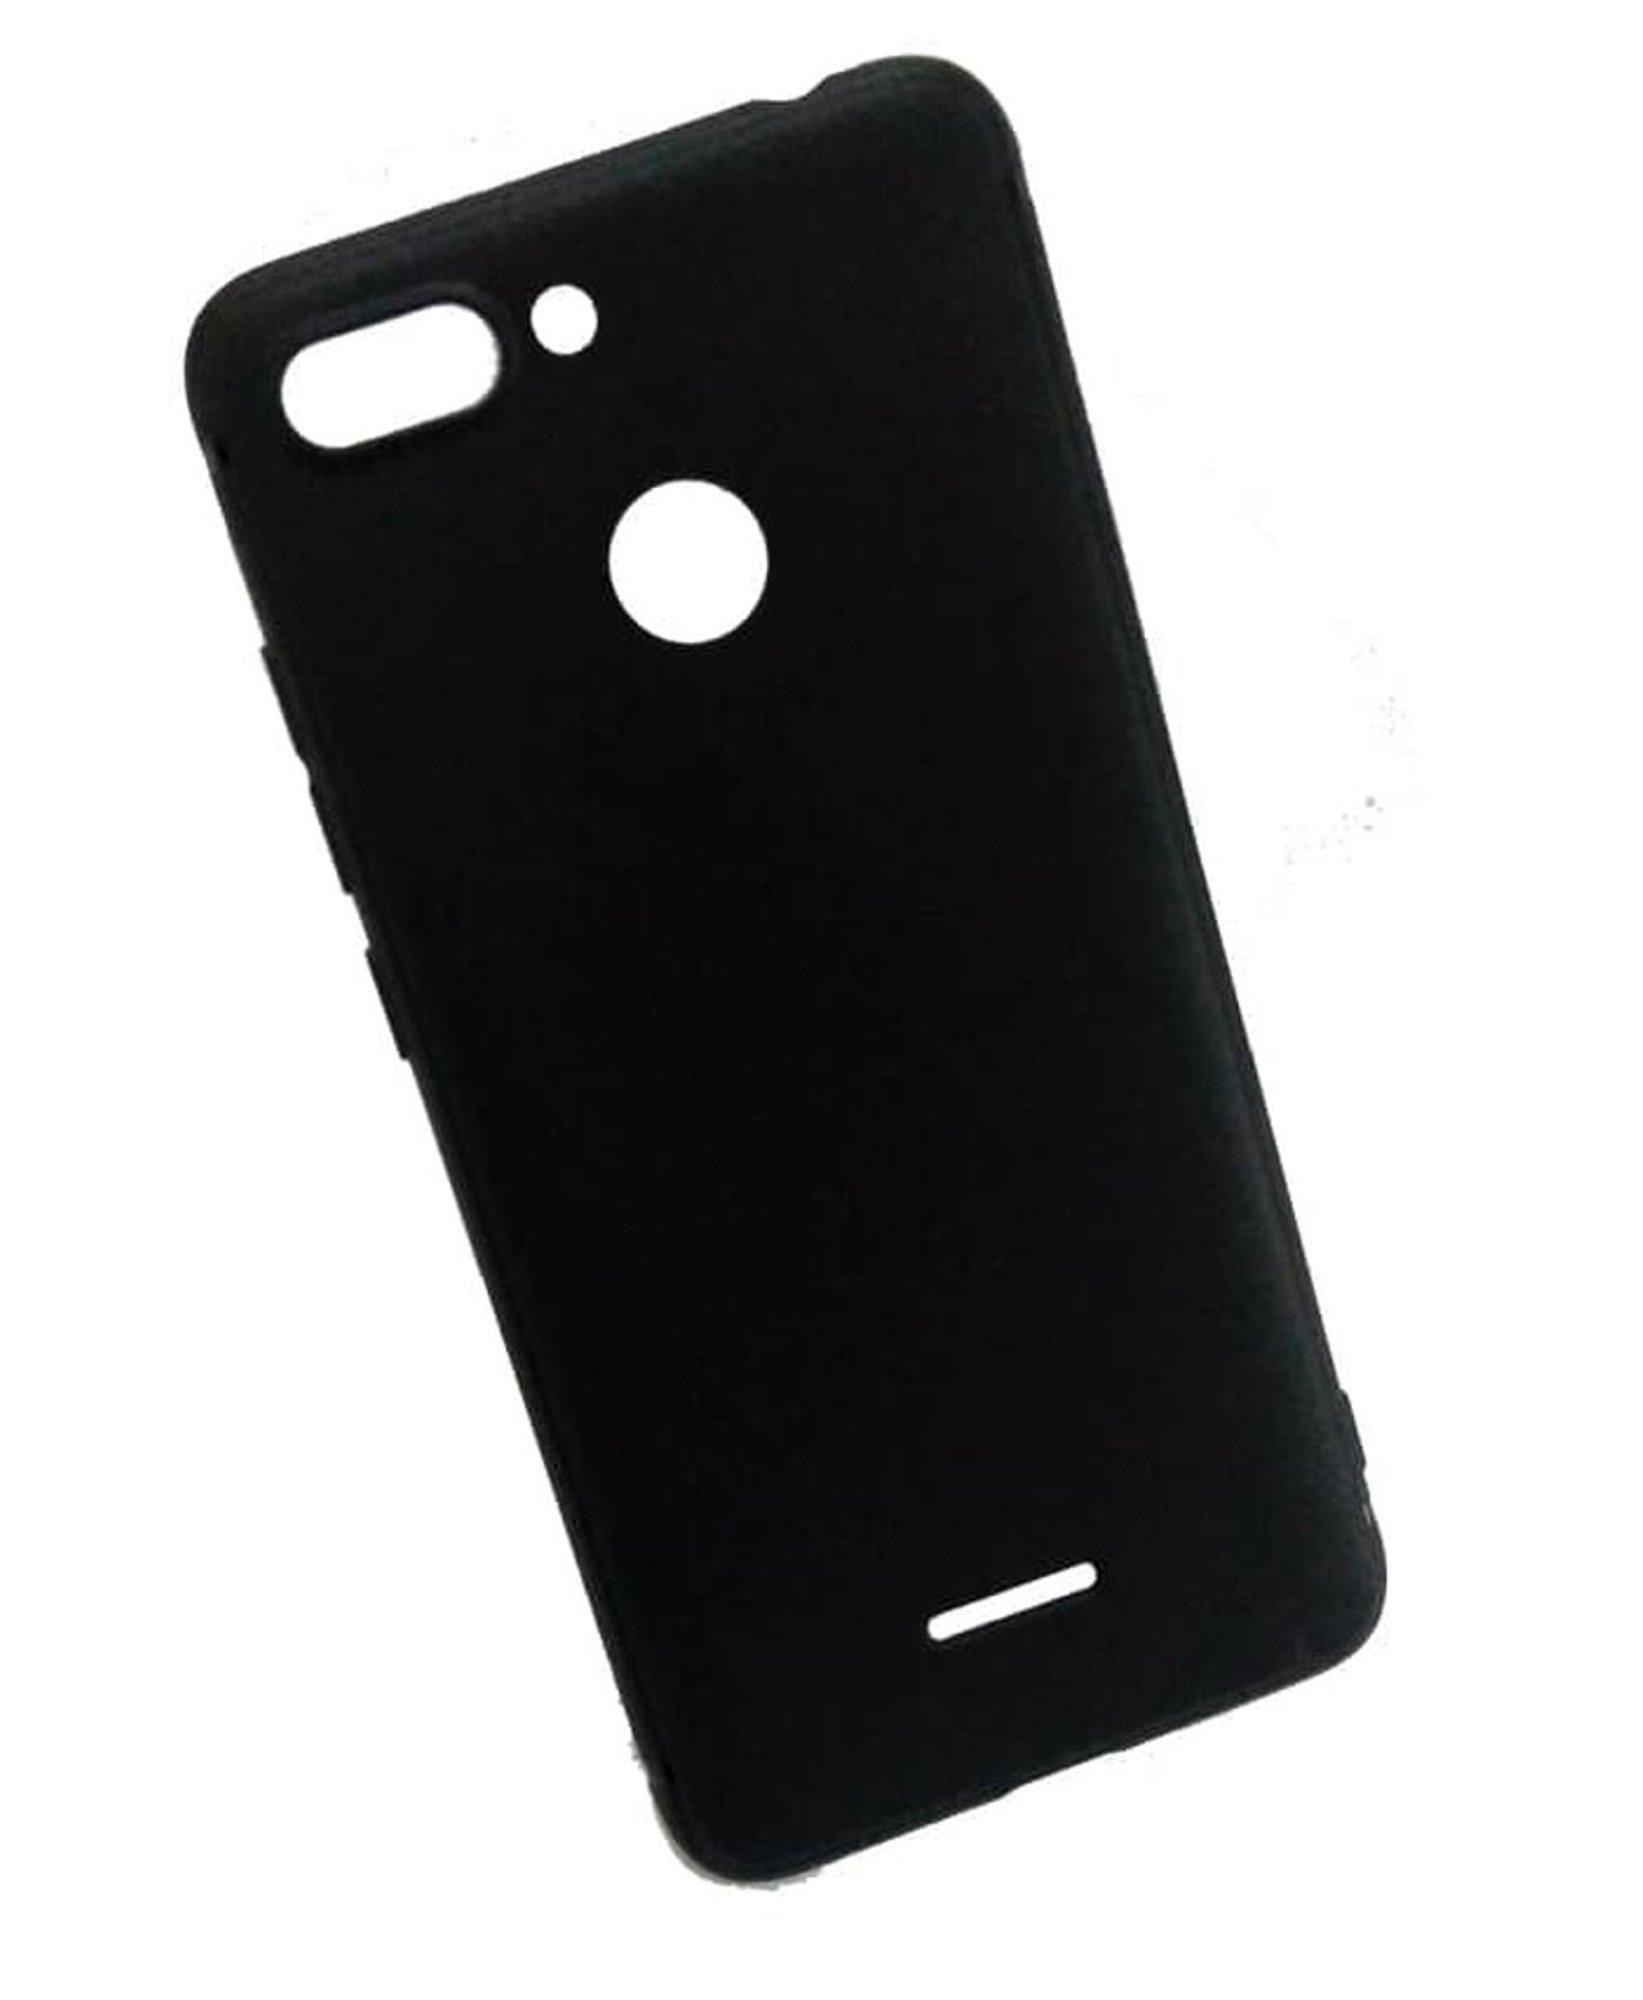 Mika HP Xiaomi Redmi 6 Terbaru Softcase Matte Spesial Edisi Black